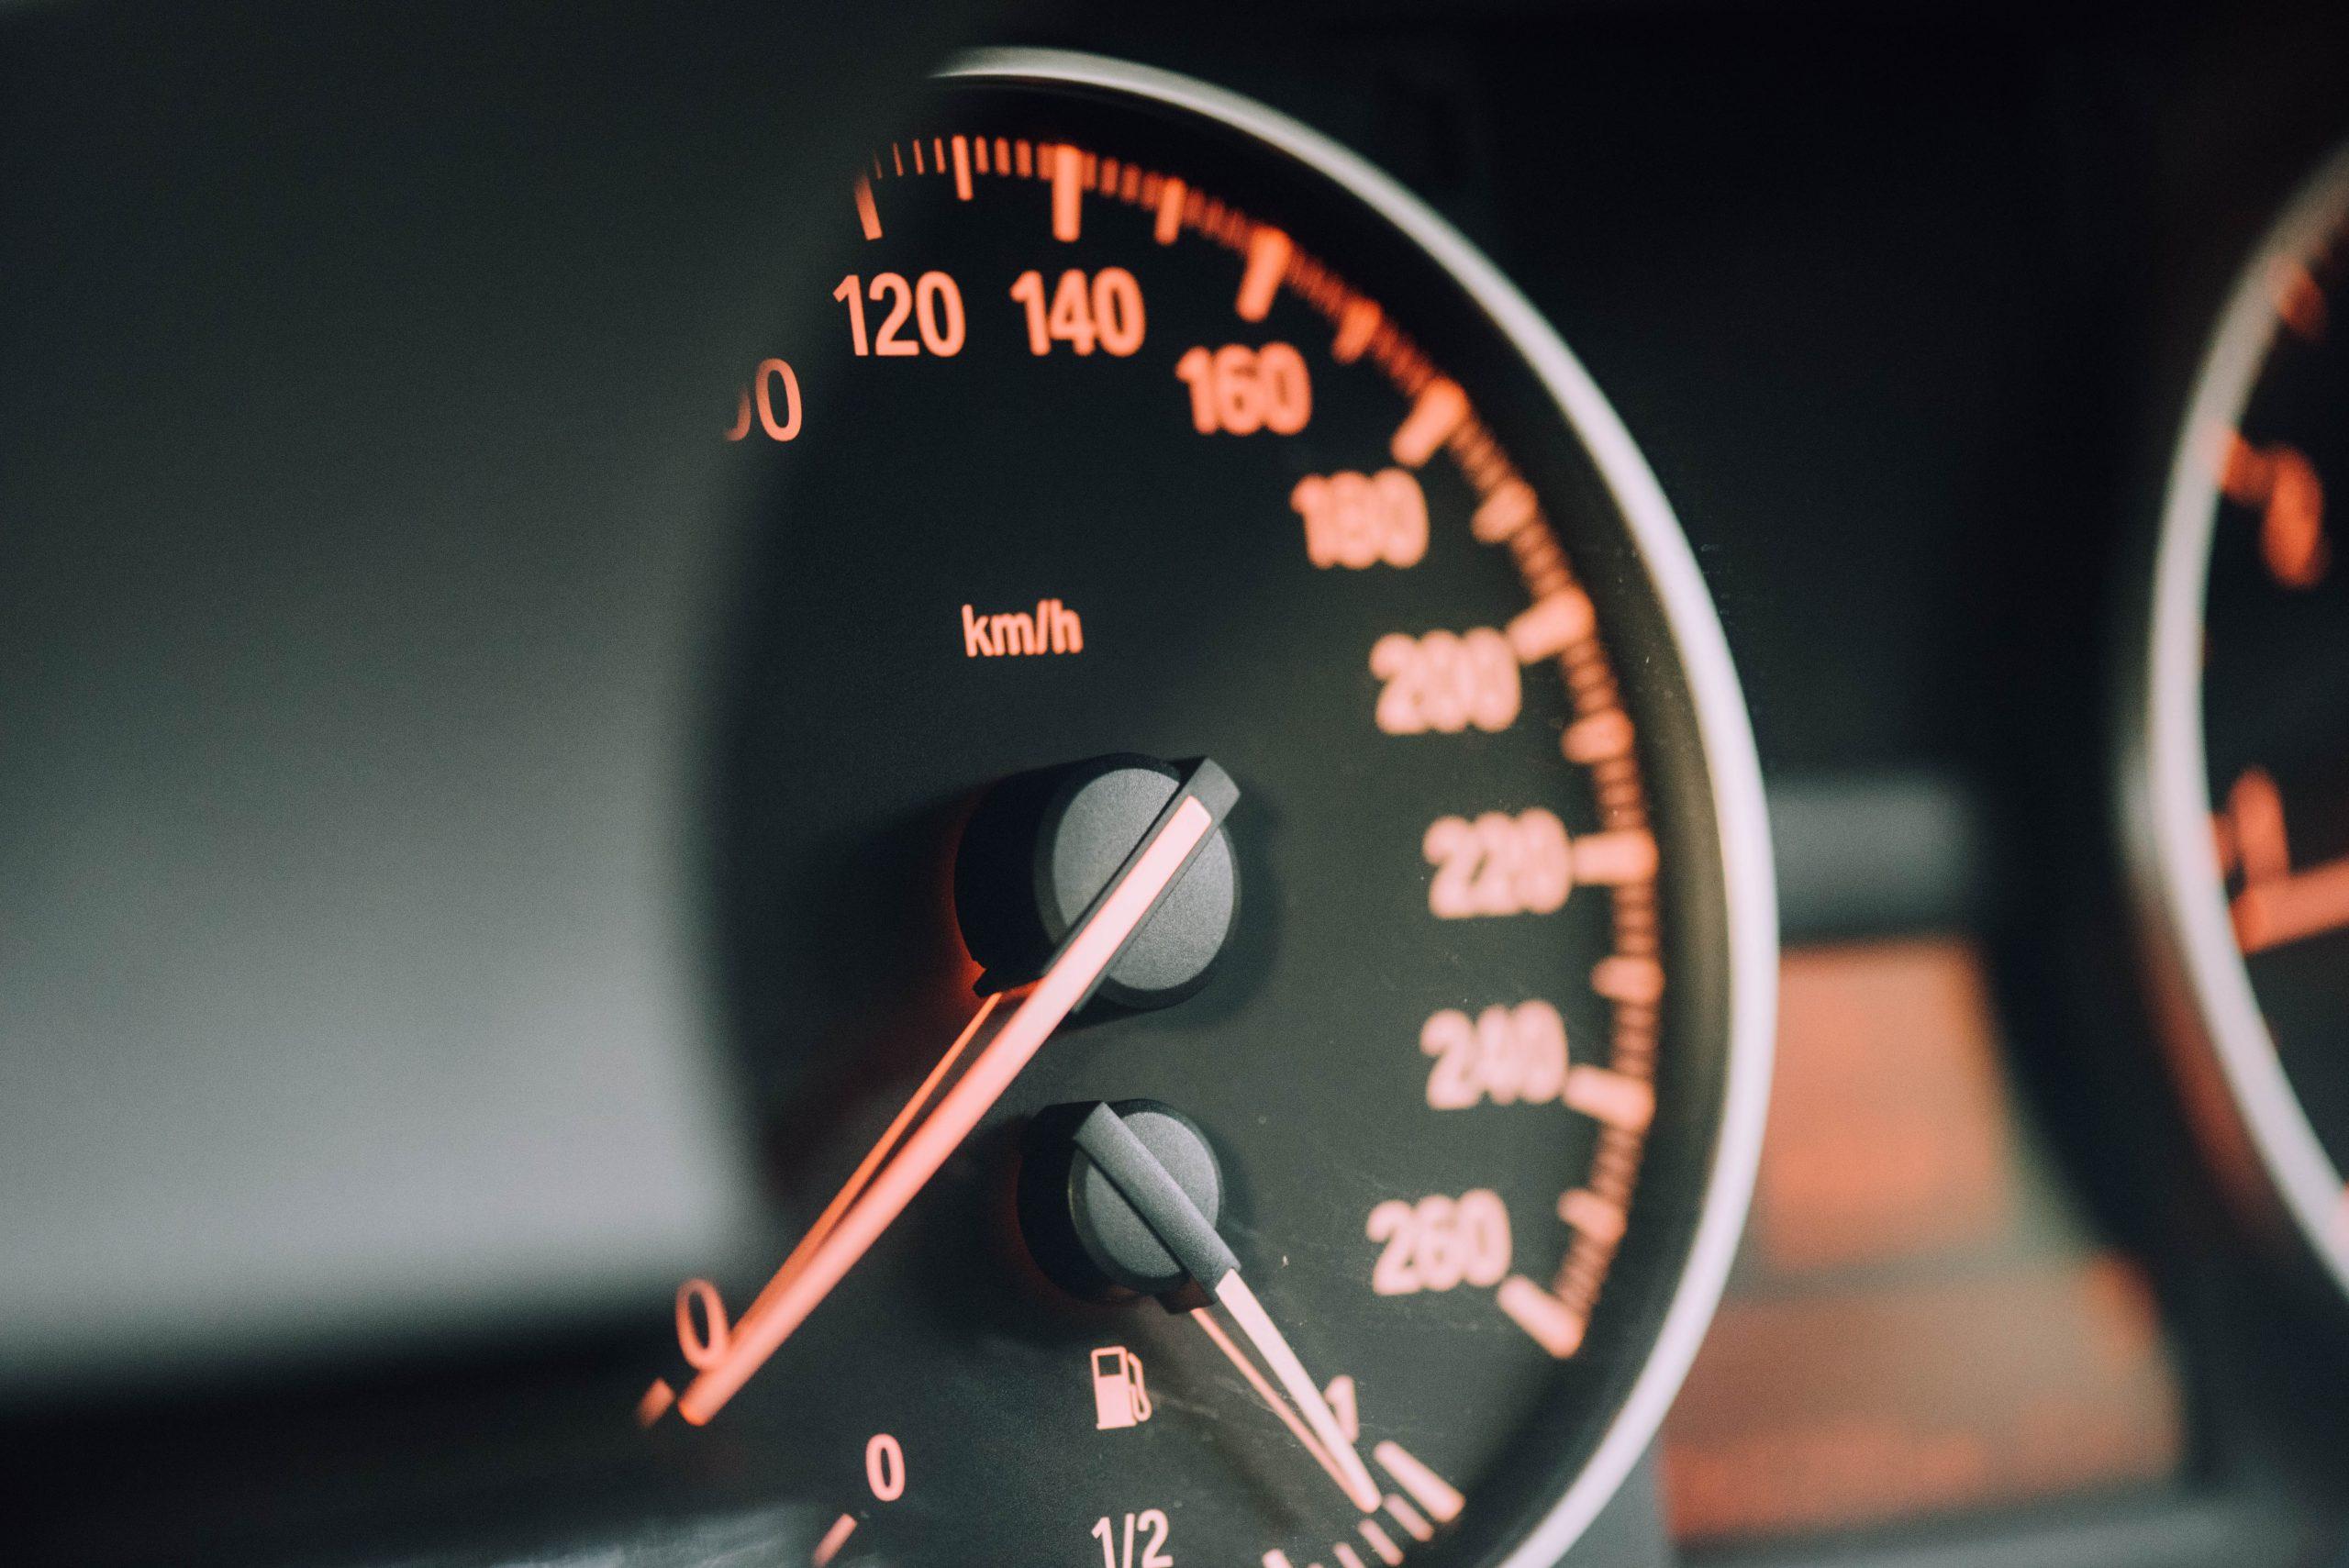 A speedometer